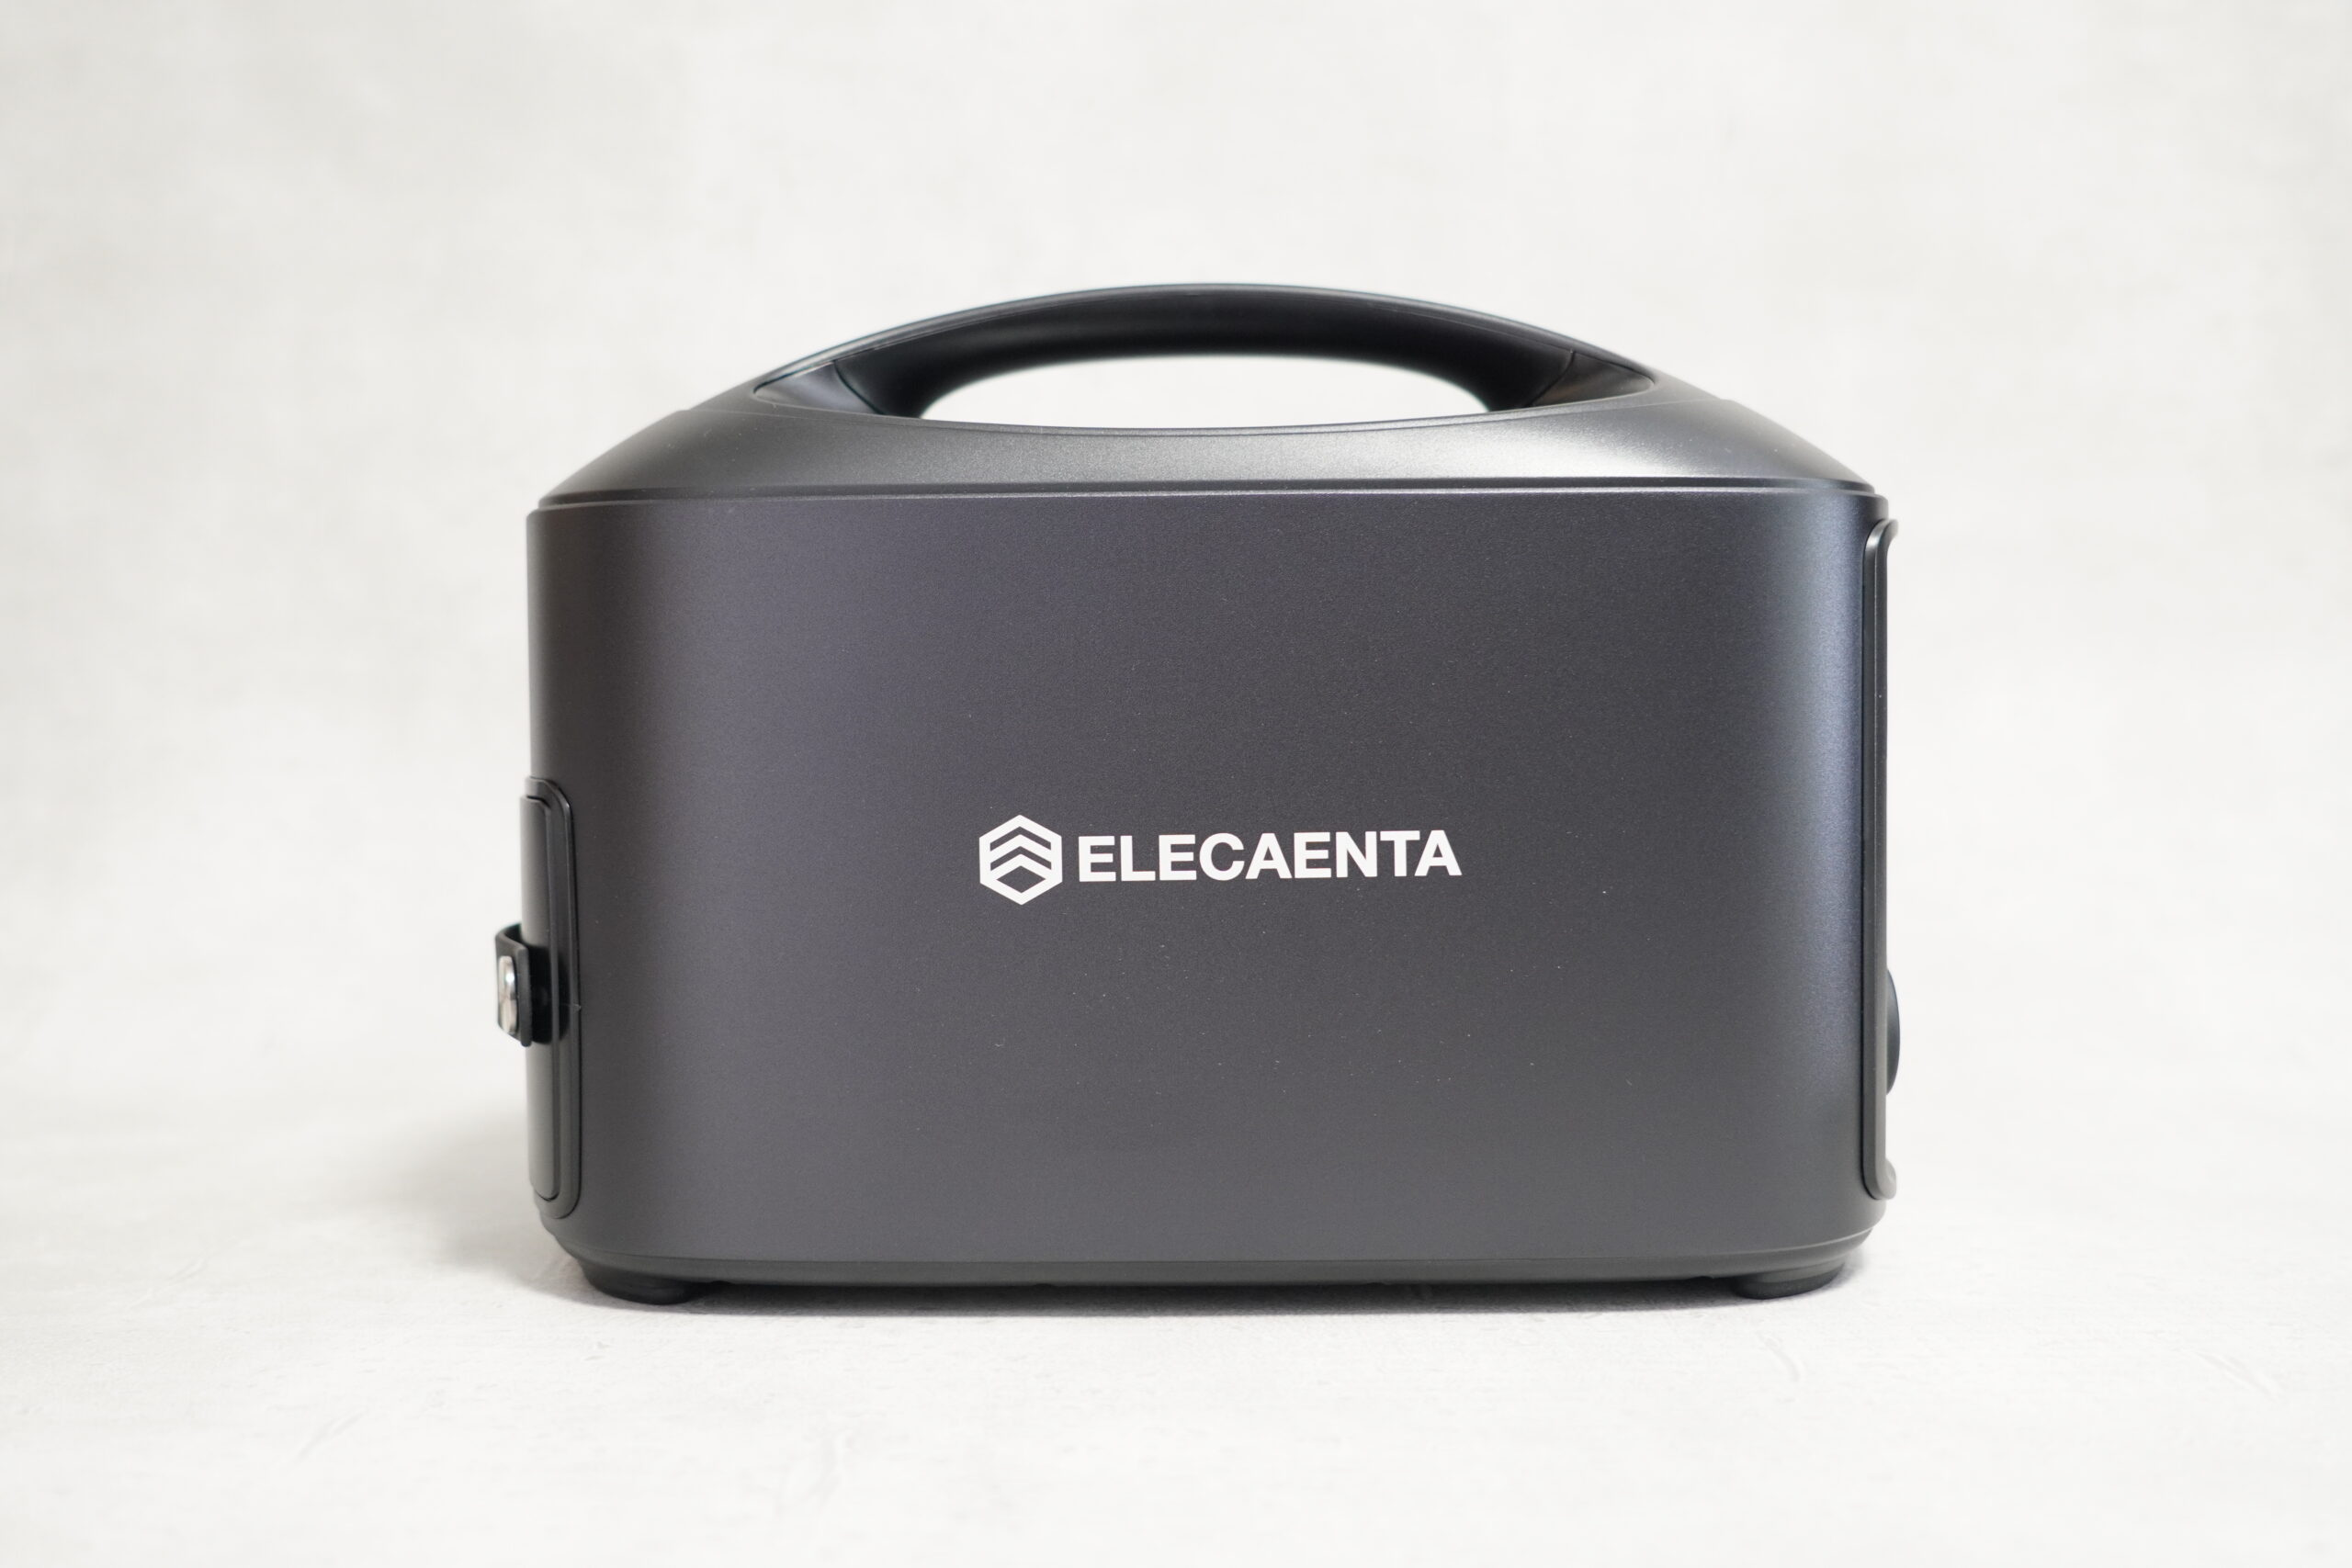 ELECAENTA S600W ポータブル電源 本体外観